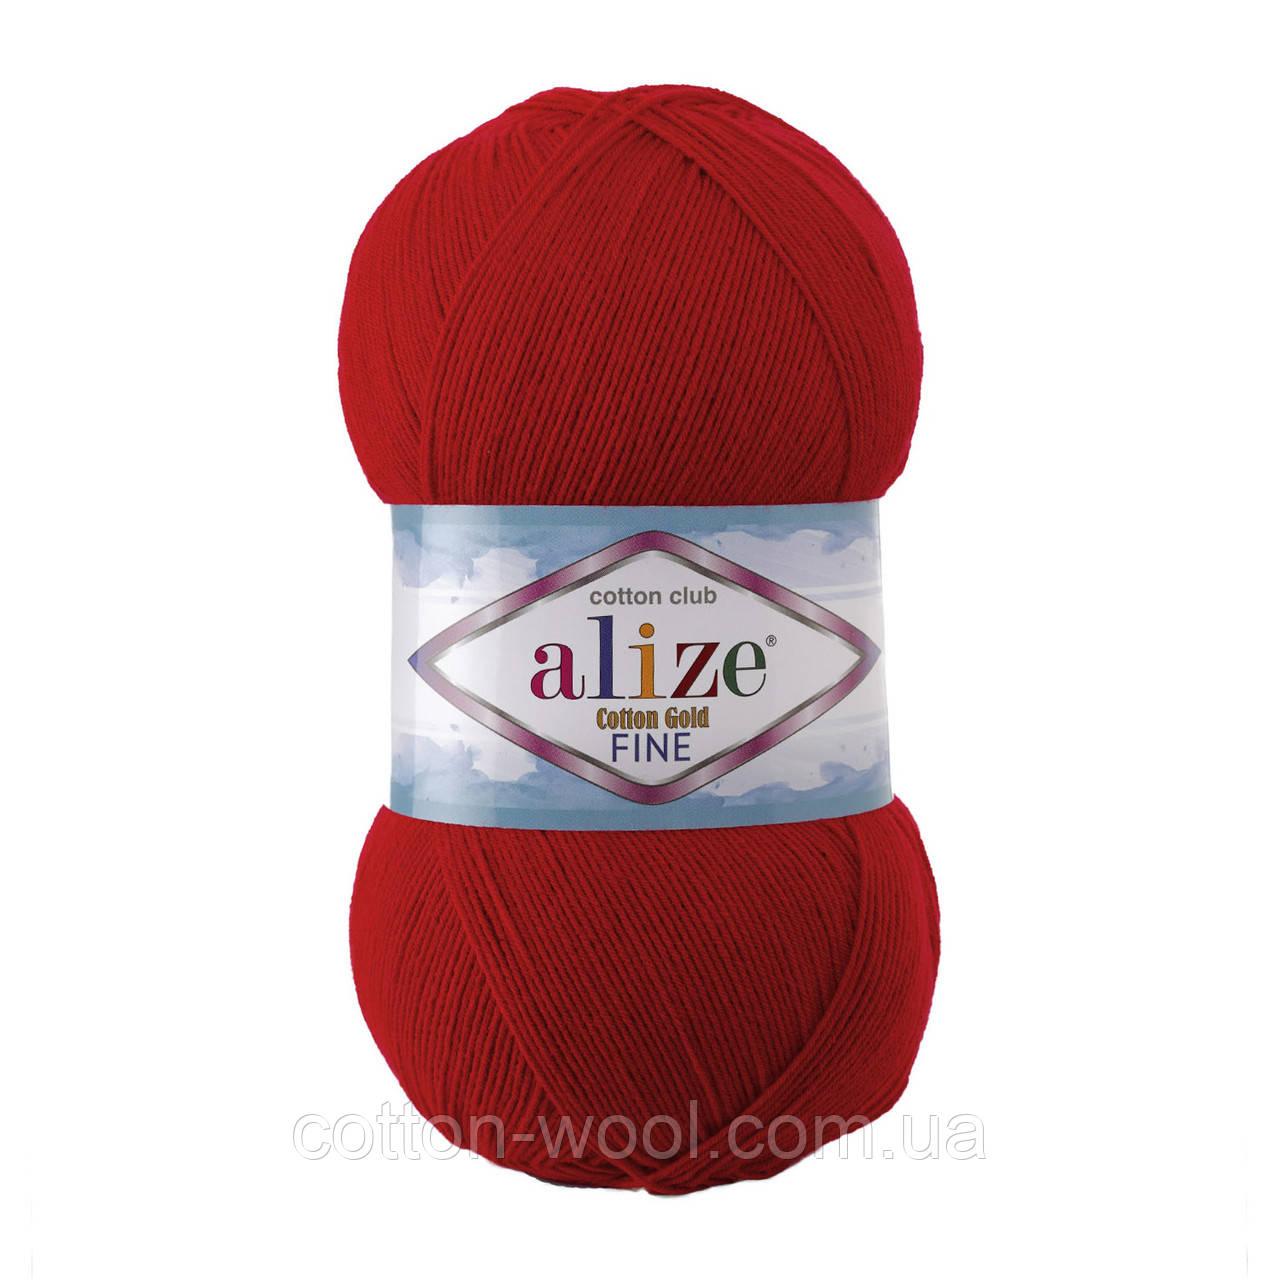 Alize Cotton  Gold Fine (Коттон Голд Файн) 55% - бавовна, 45% - акріл 56